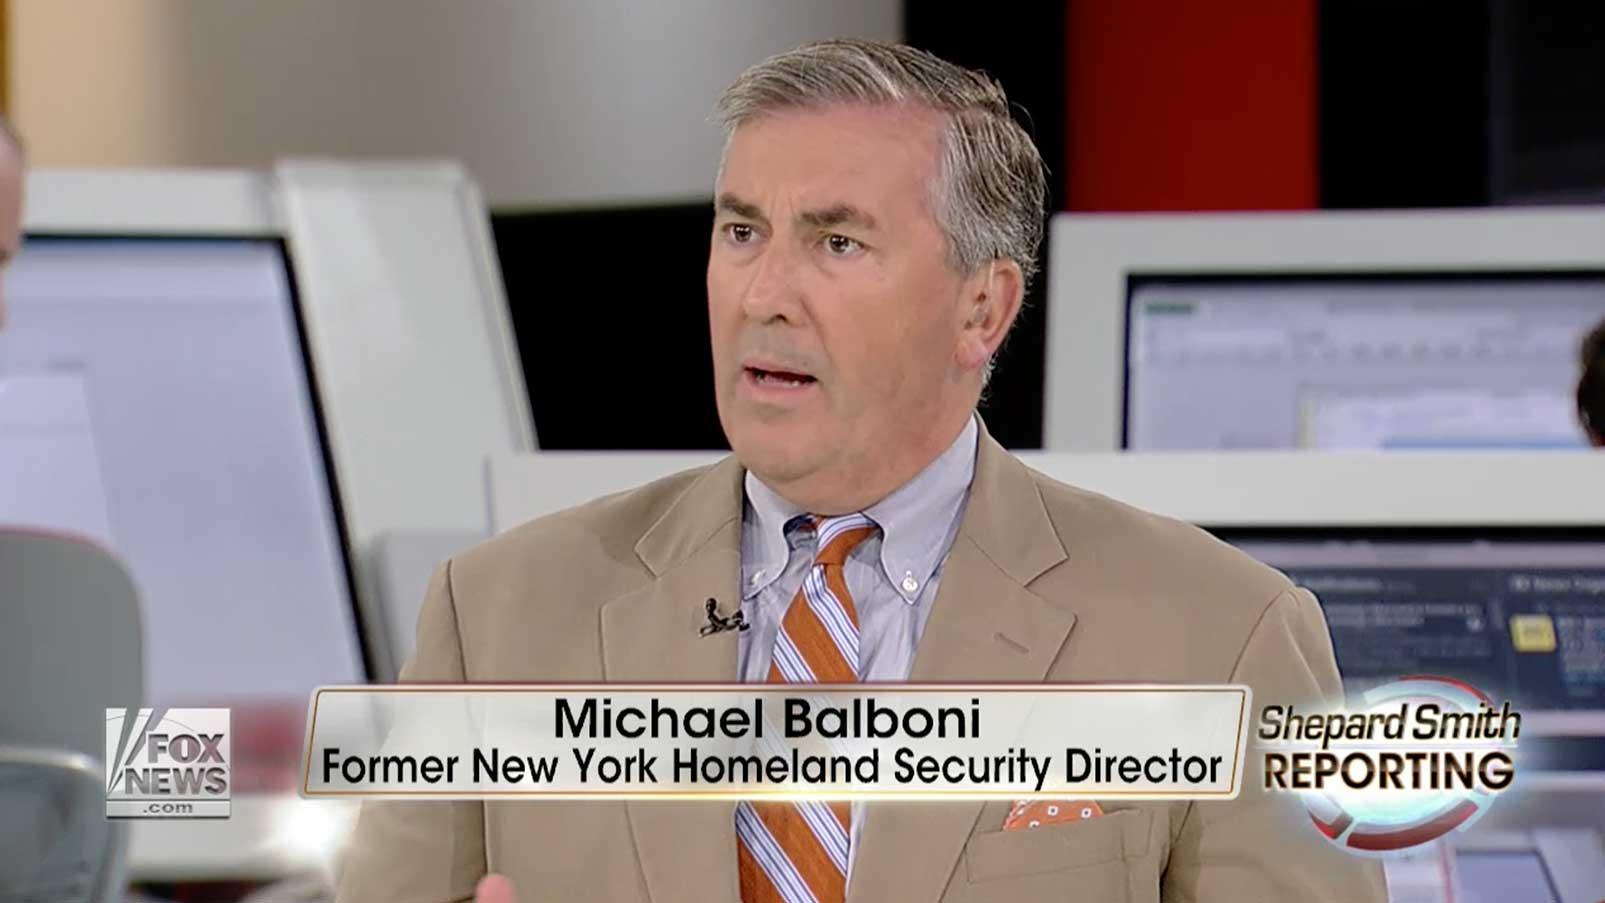 FOX News 06-24-14